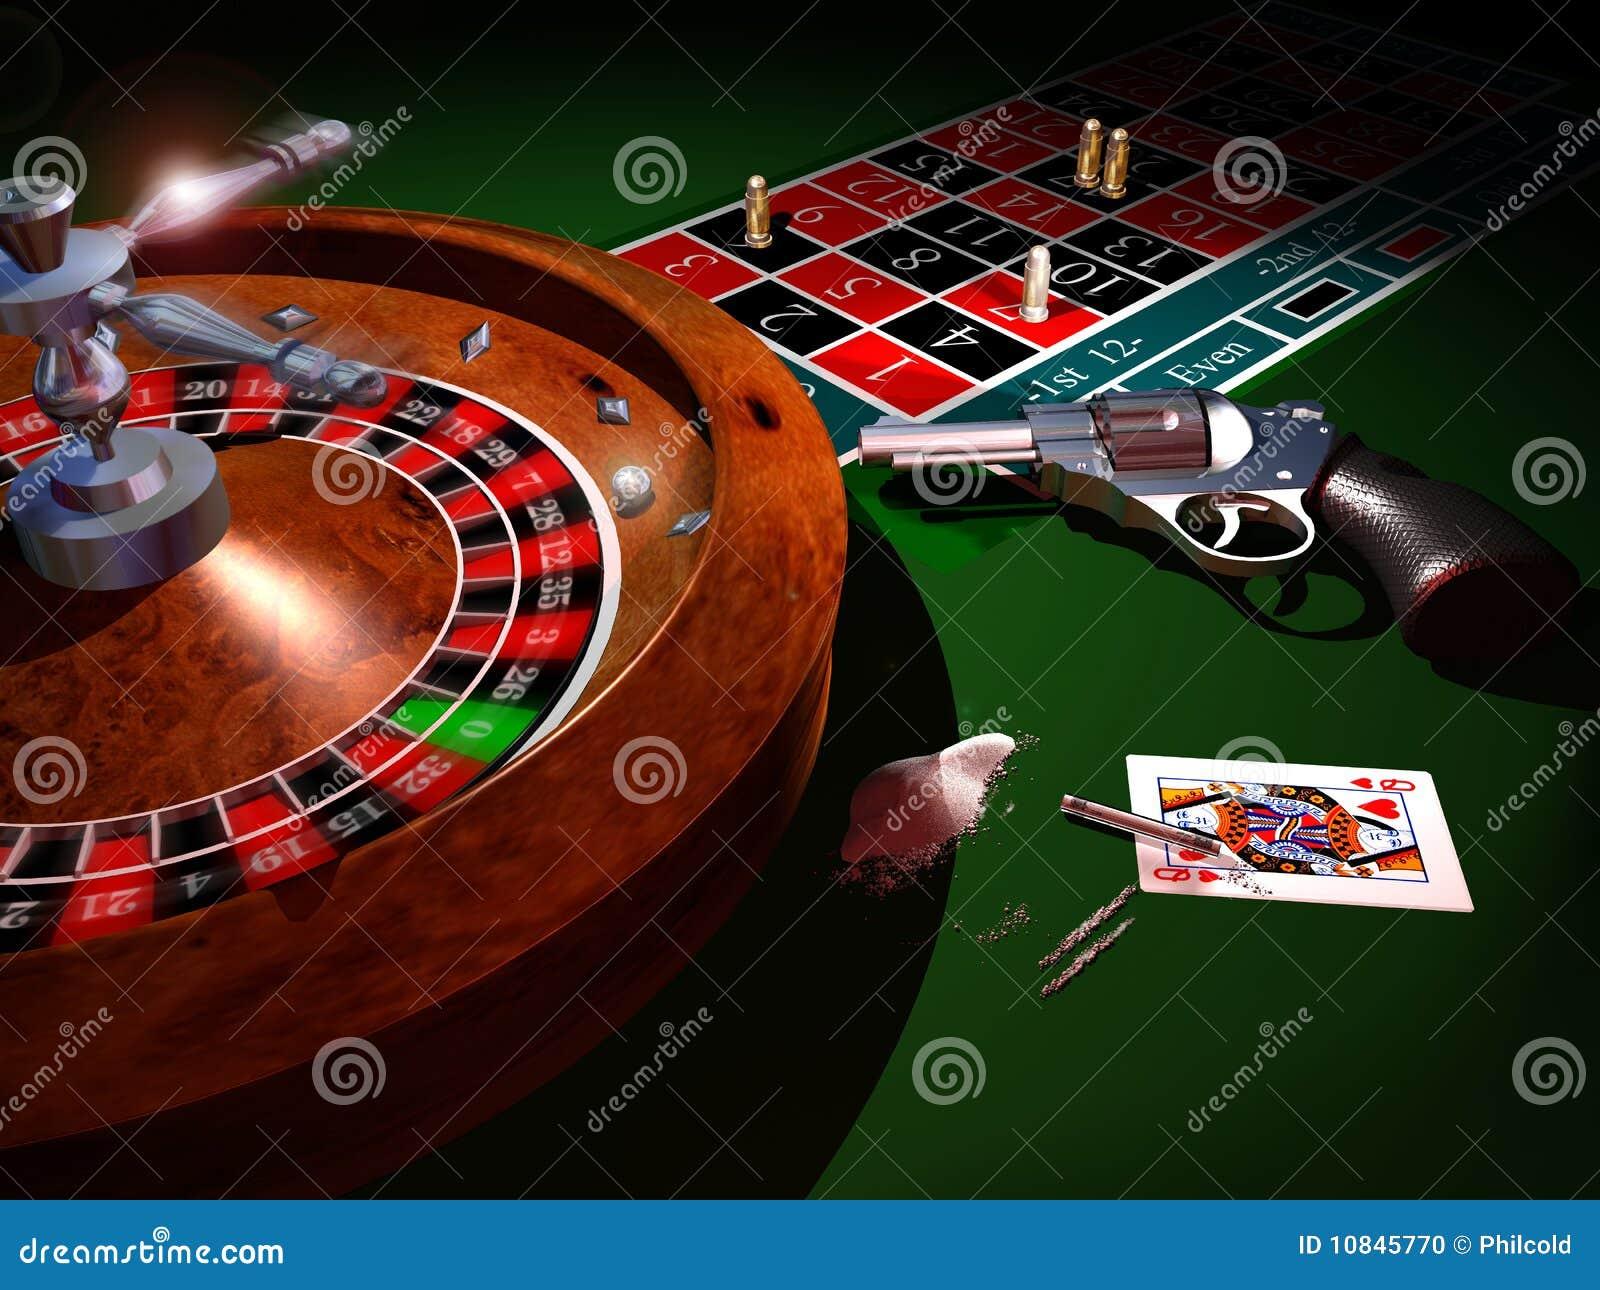 Russian roulette juego